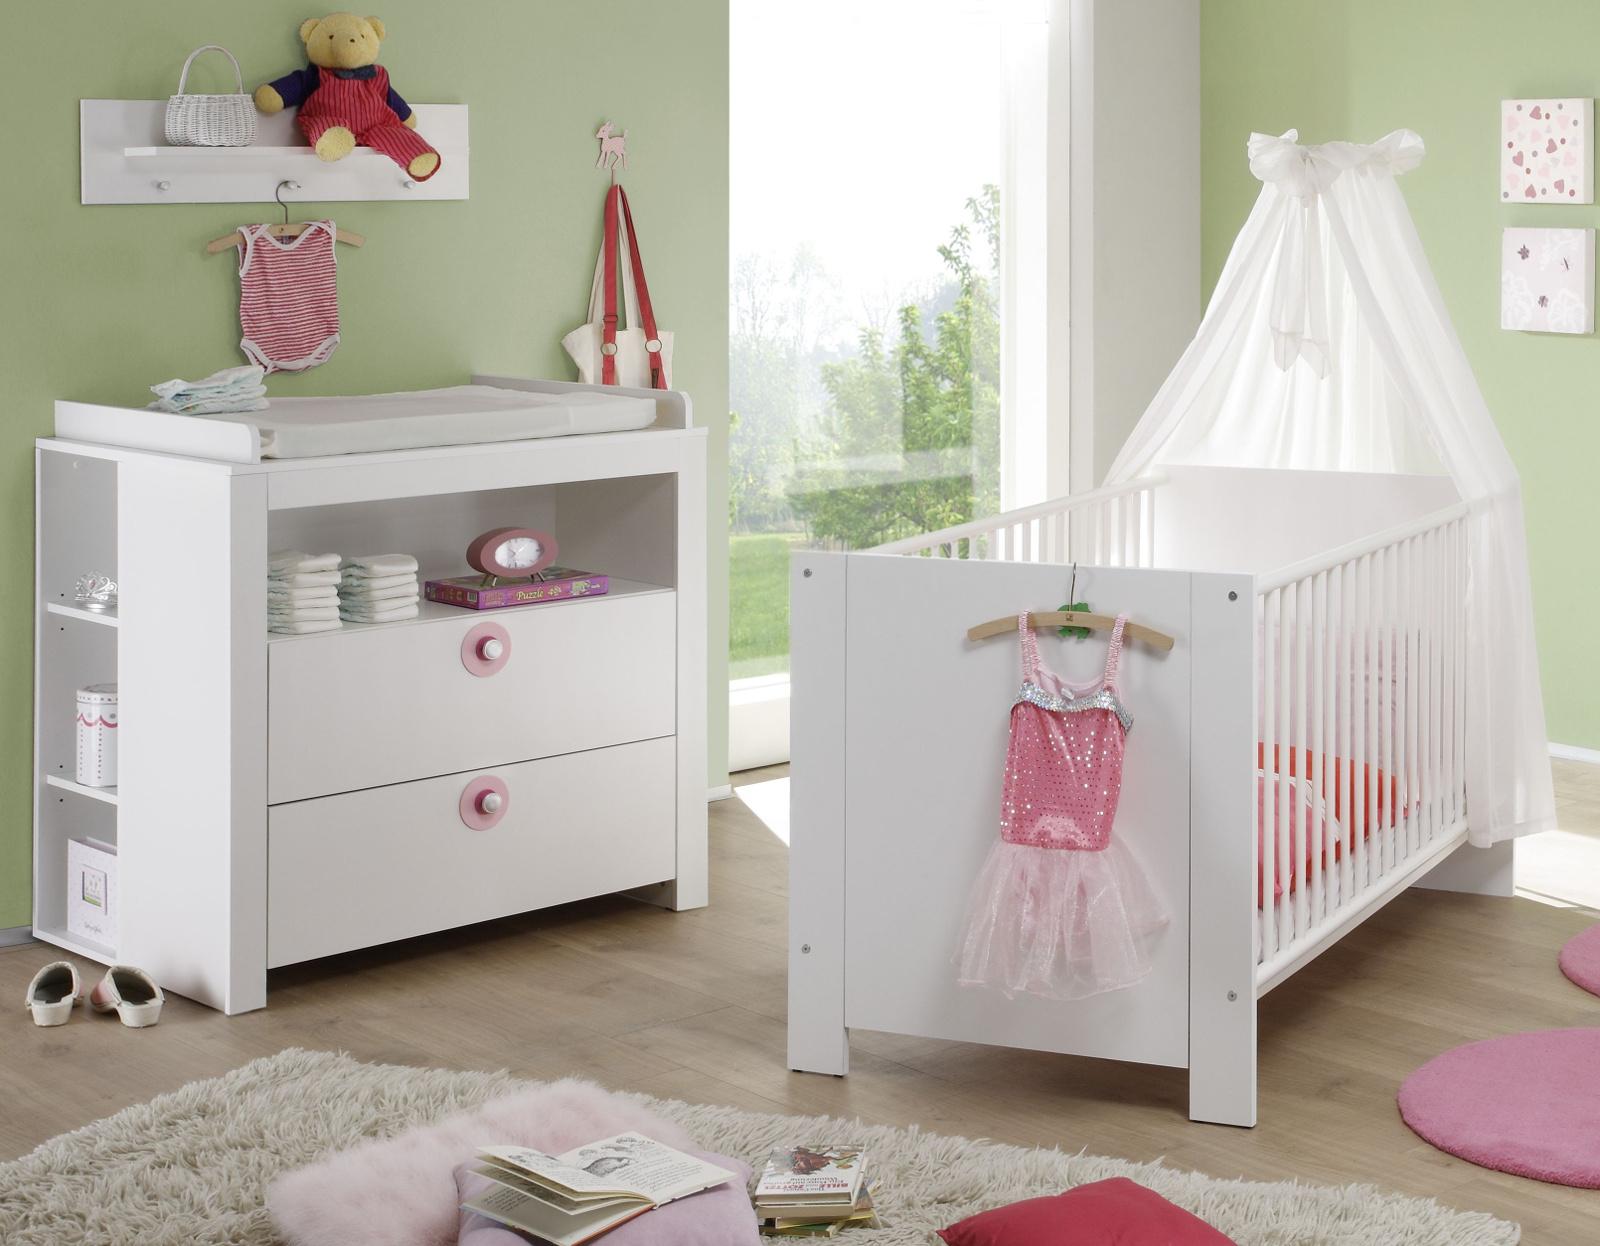 Paula Set Bett Kommode Babybett Kinderbettwickelkommodekomplettset